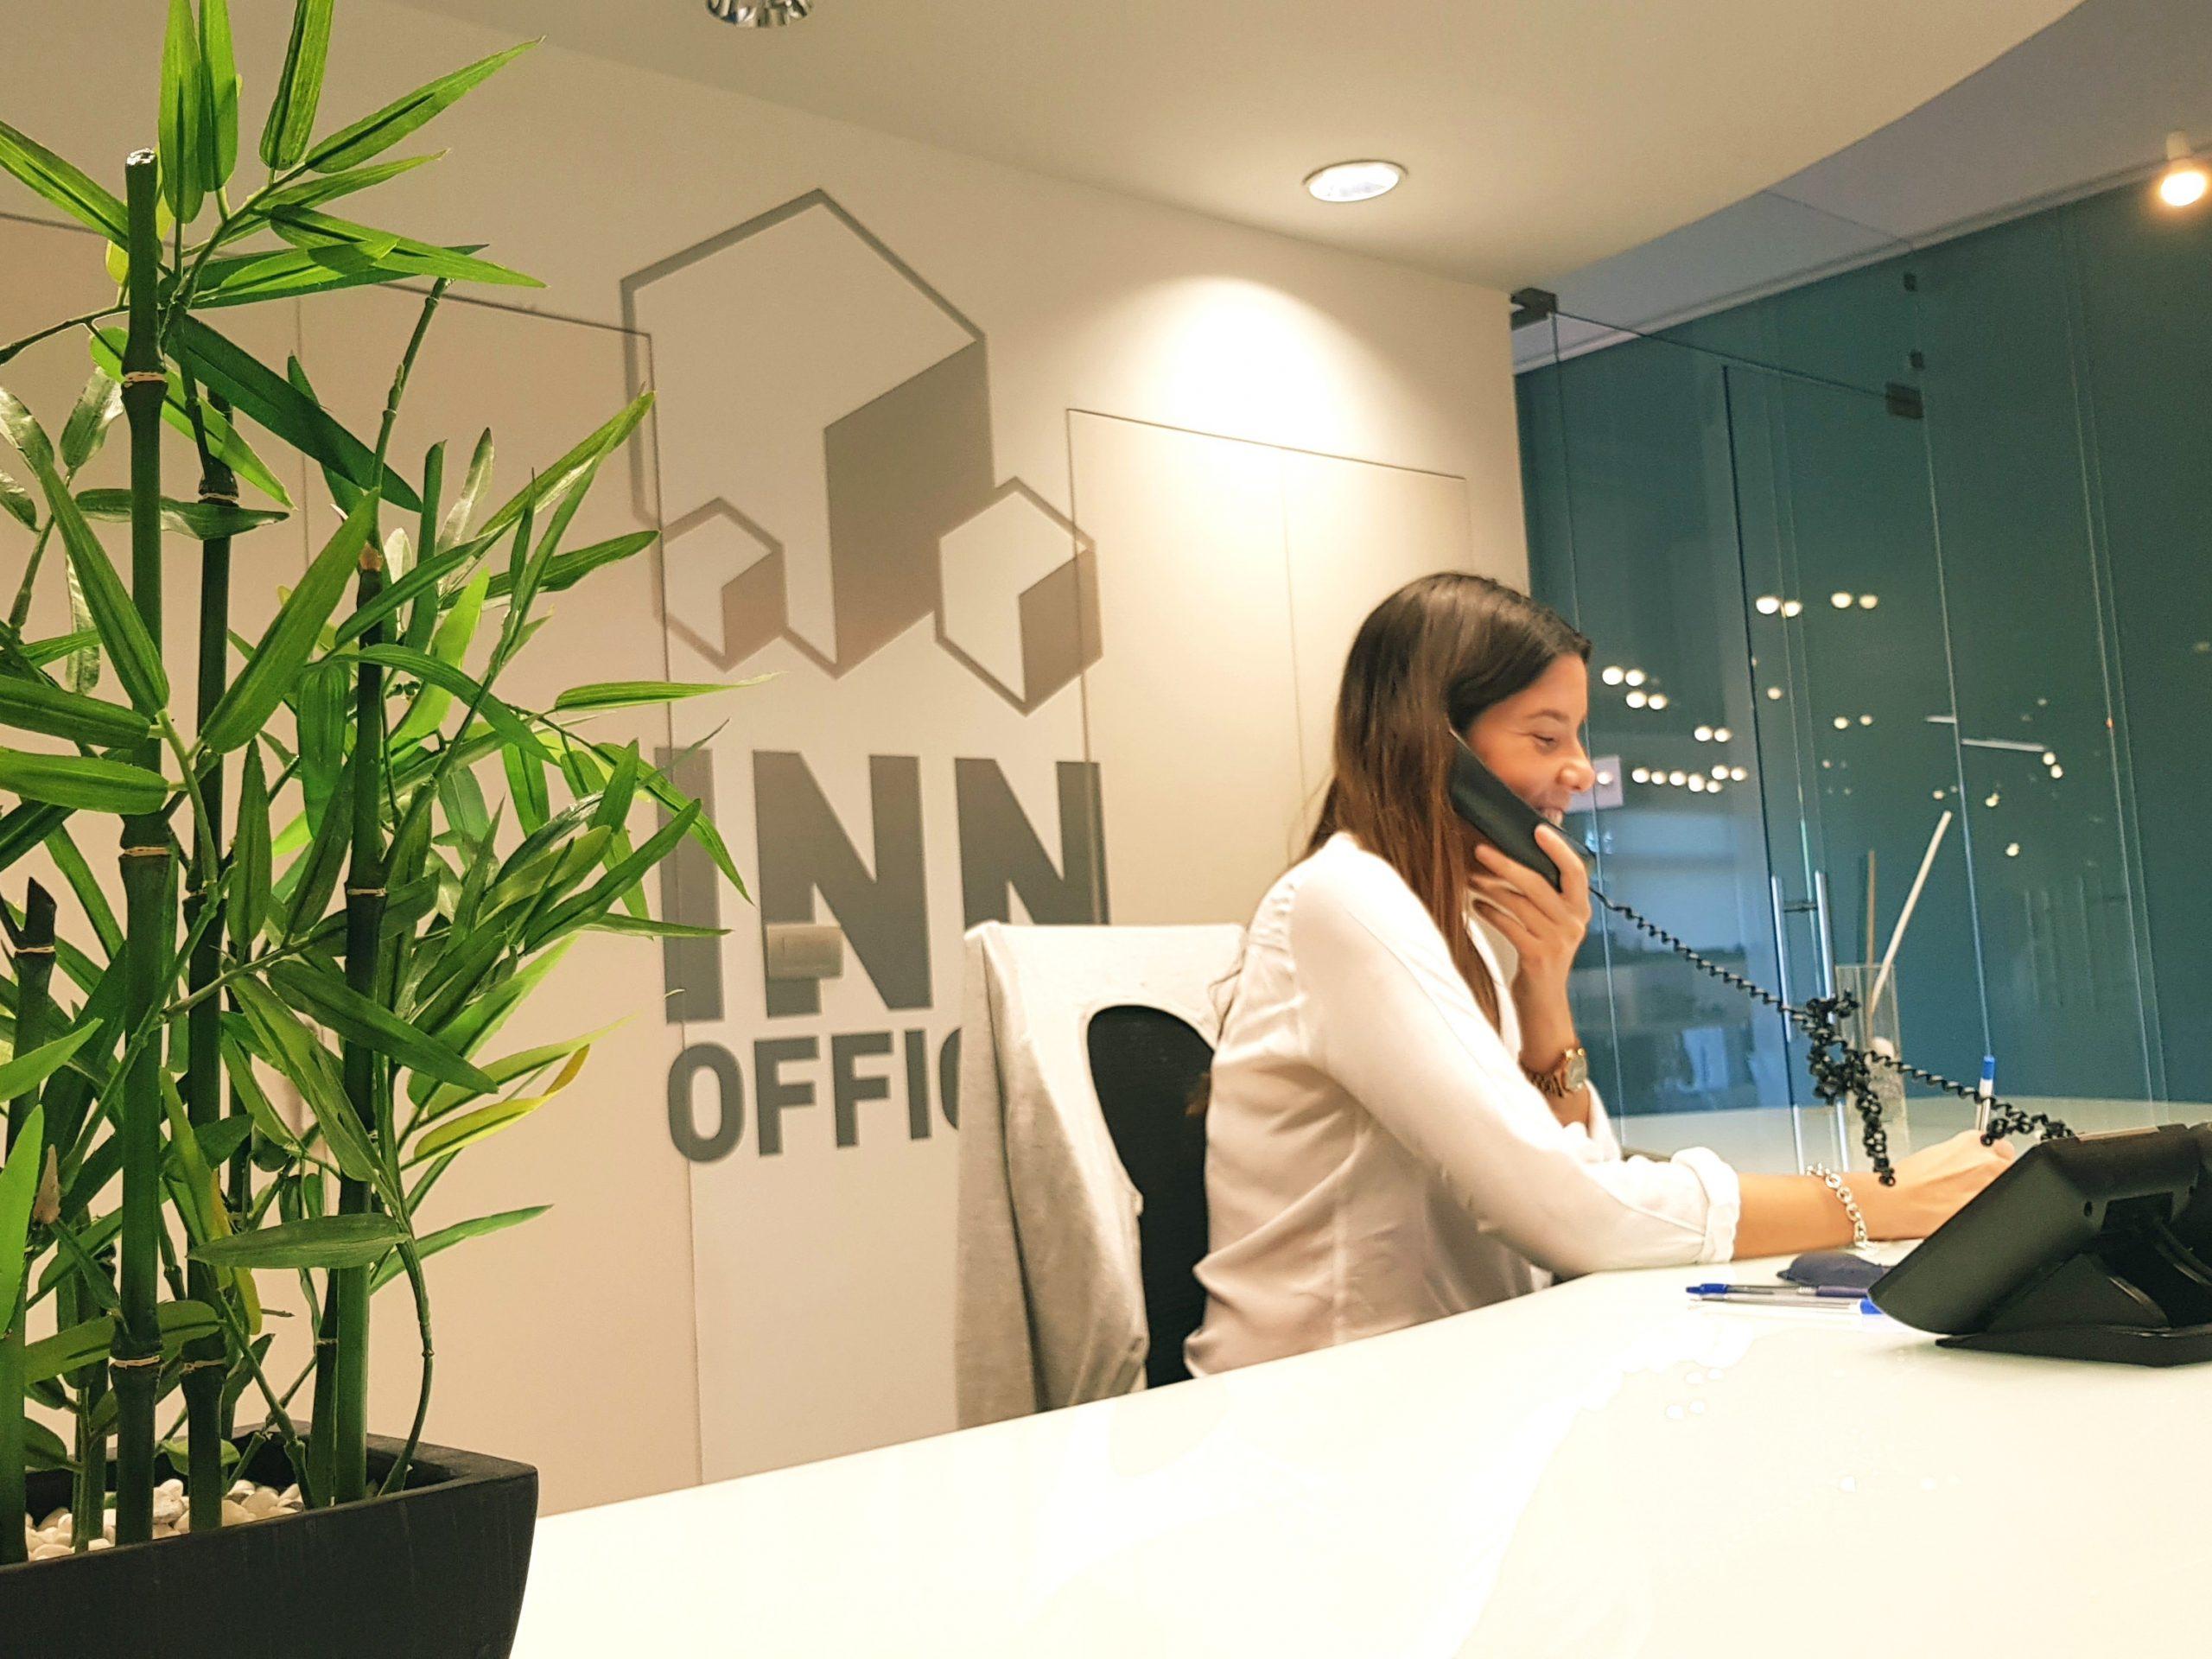 INN Offices Estadio Olímpico de la Cartuja de Sevilla